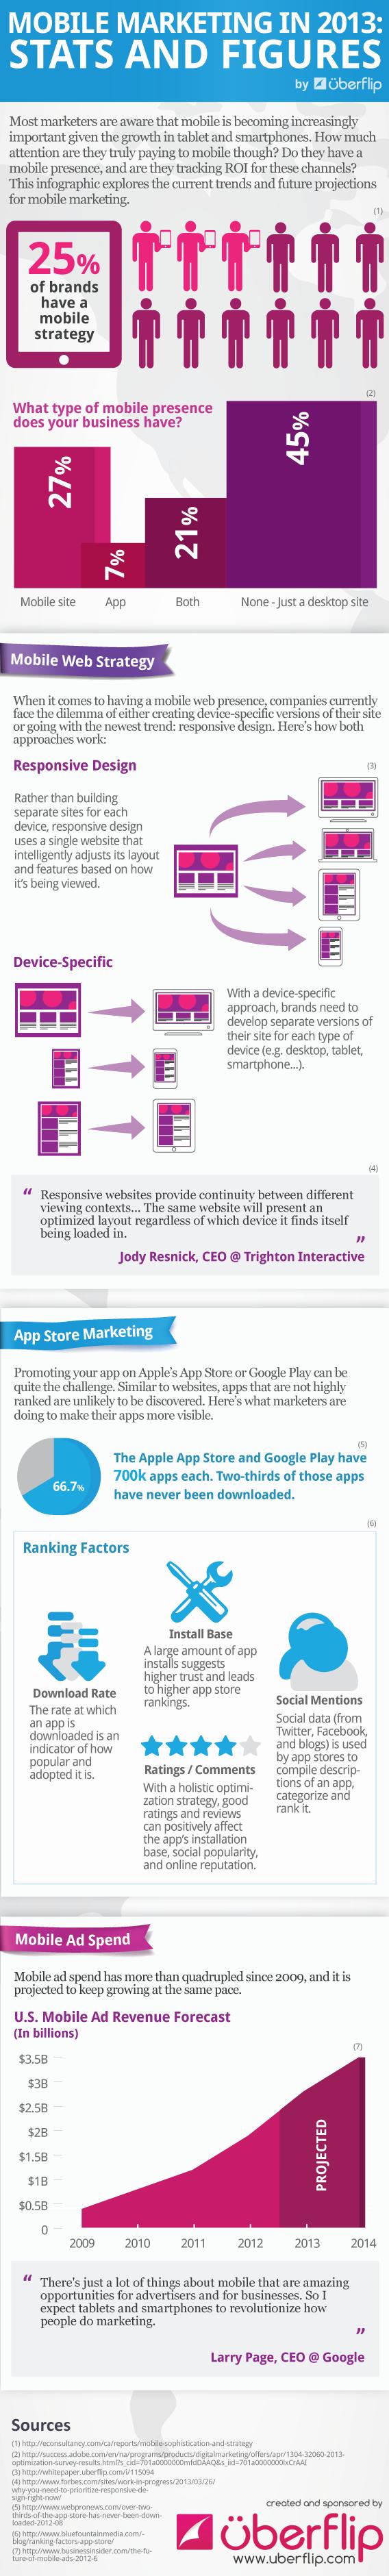 infographic_mobile_marketing_uberflip (1)